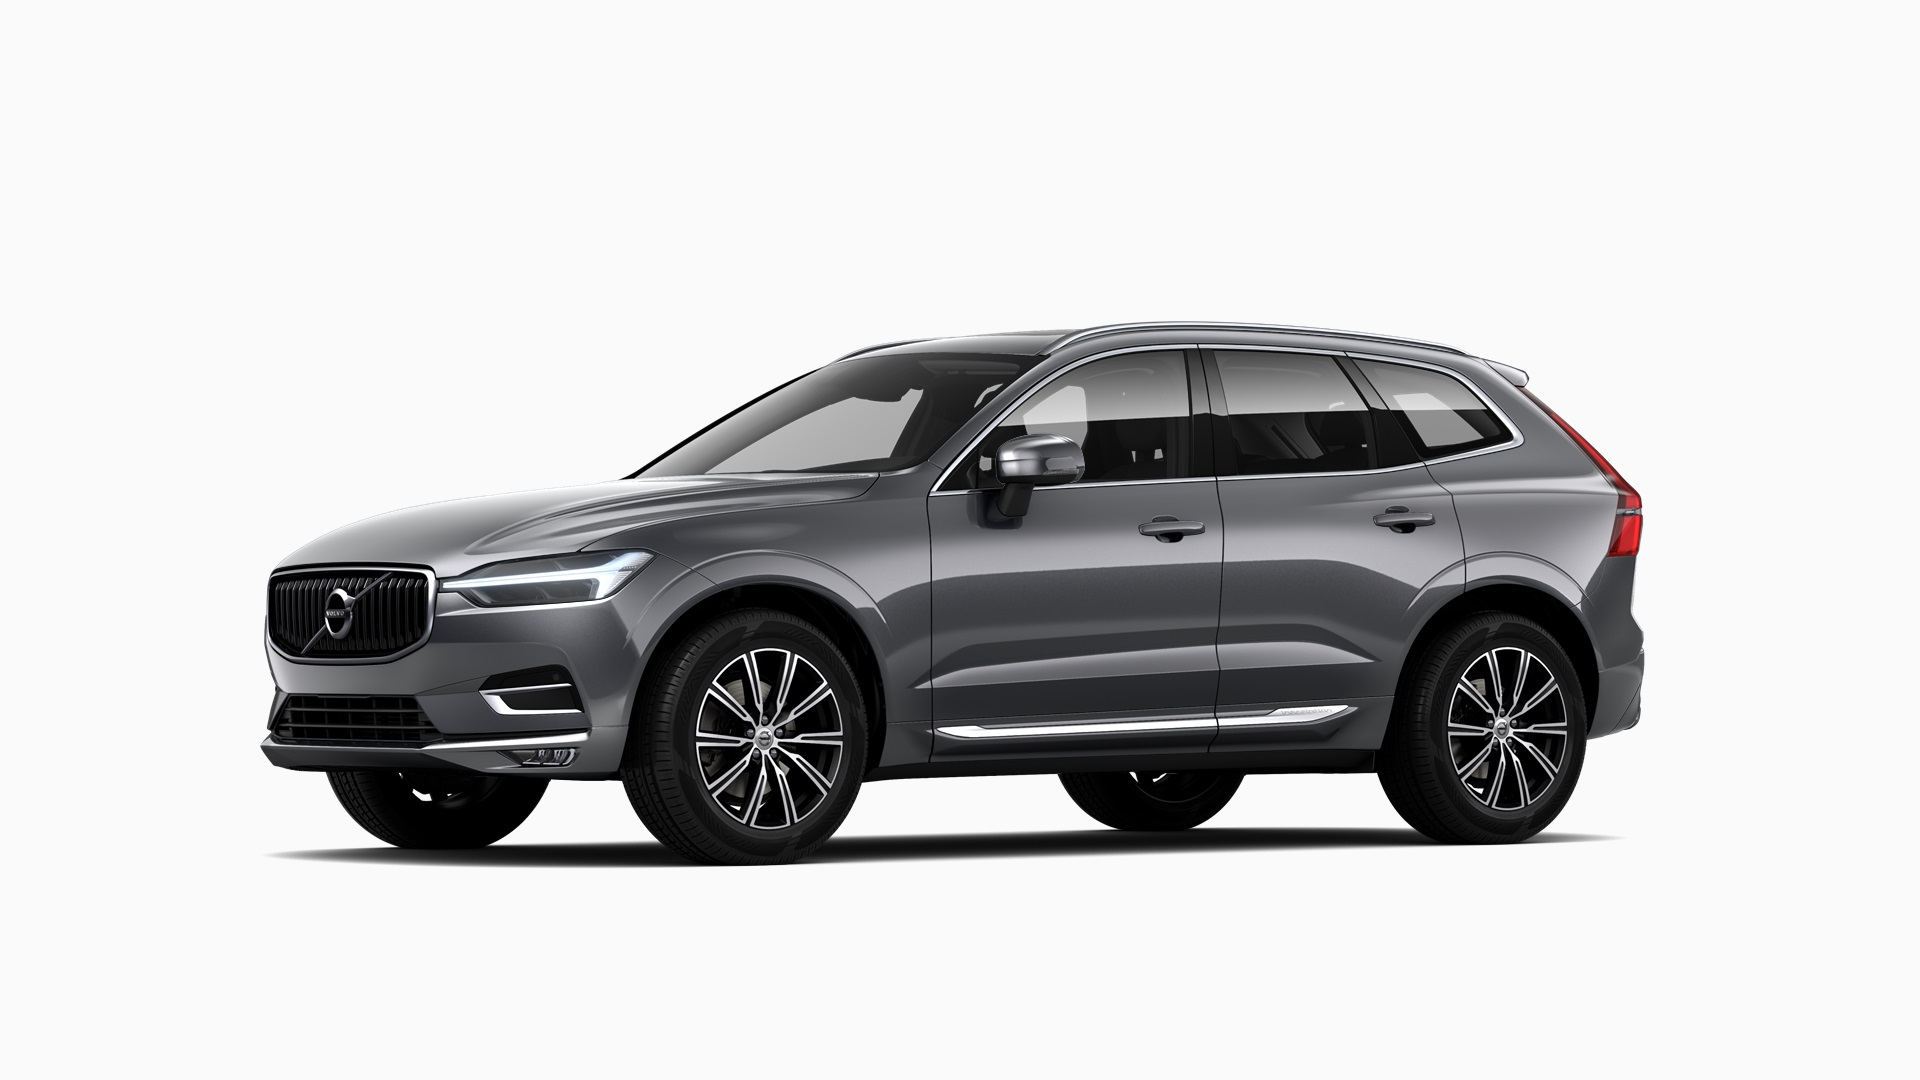 Wheel City Motors >> 2019 Volvo XC60 T5 AWD Inscription - 1803886 - Capitol Motors